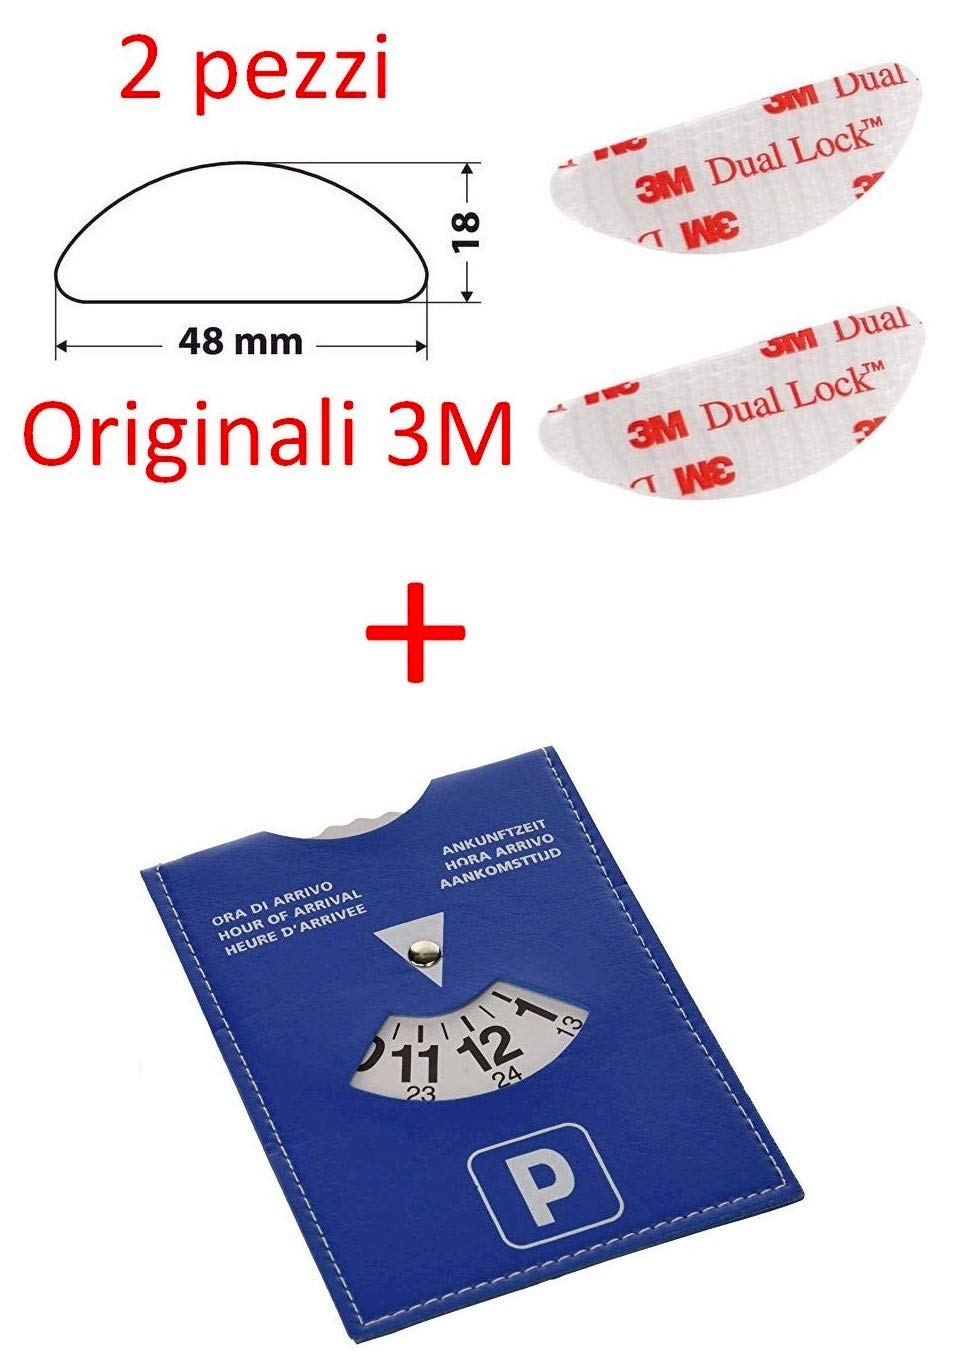 StickersLab Adesivo velcro per fissaggio Telepass originale 3M Dual Lock 4